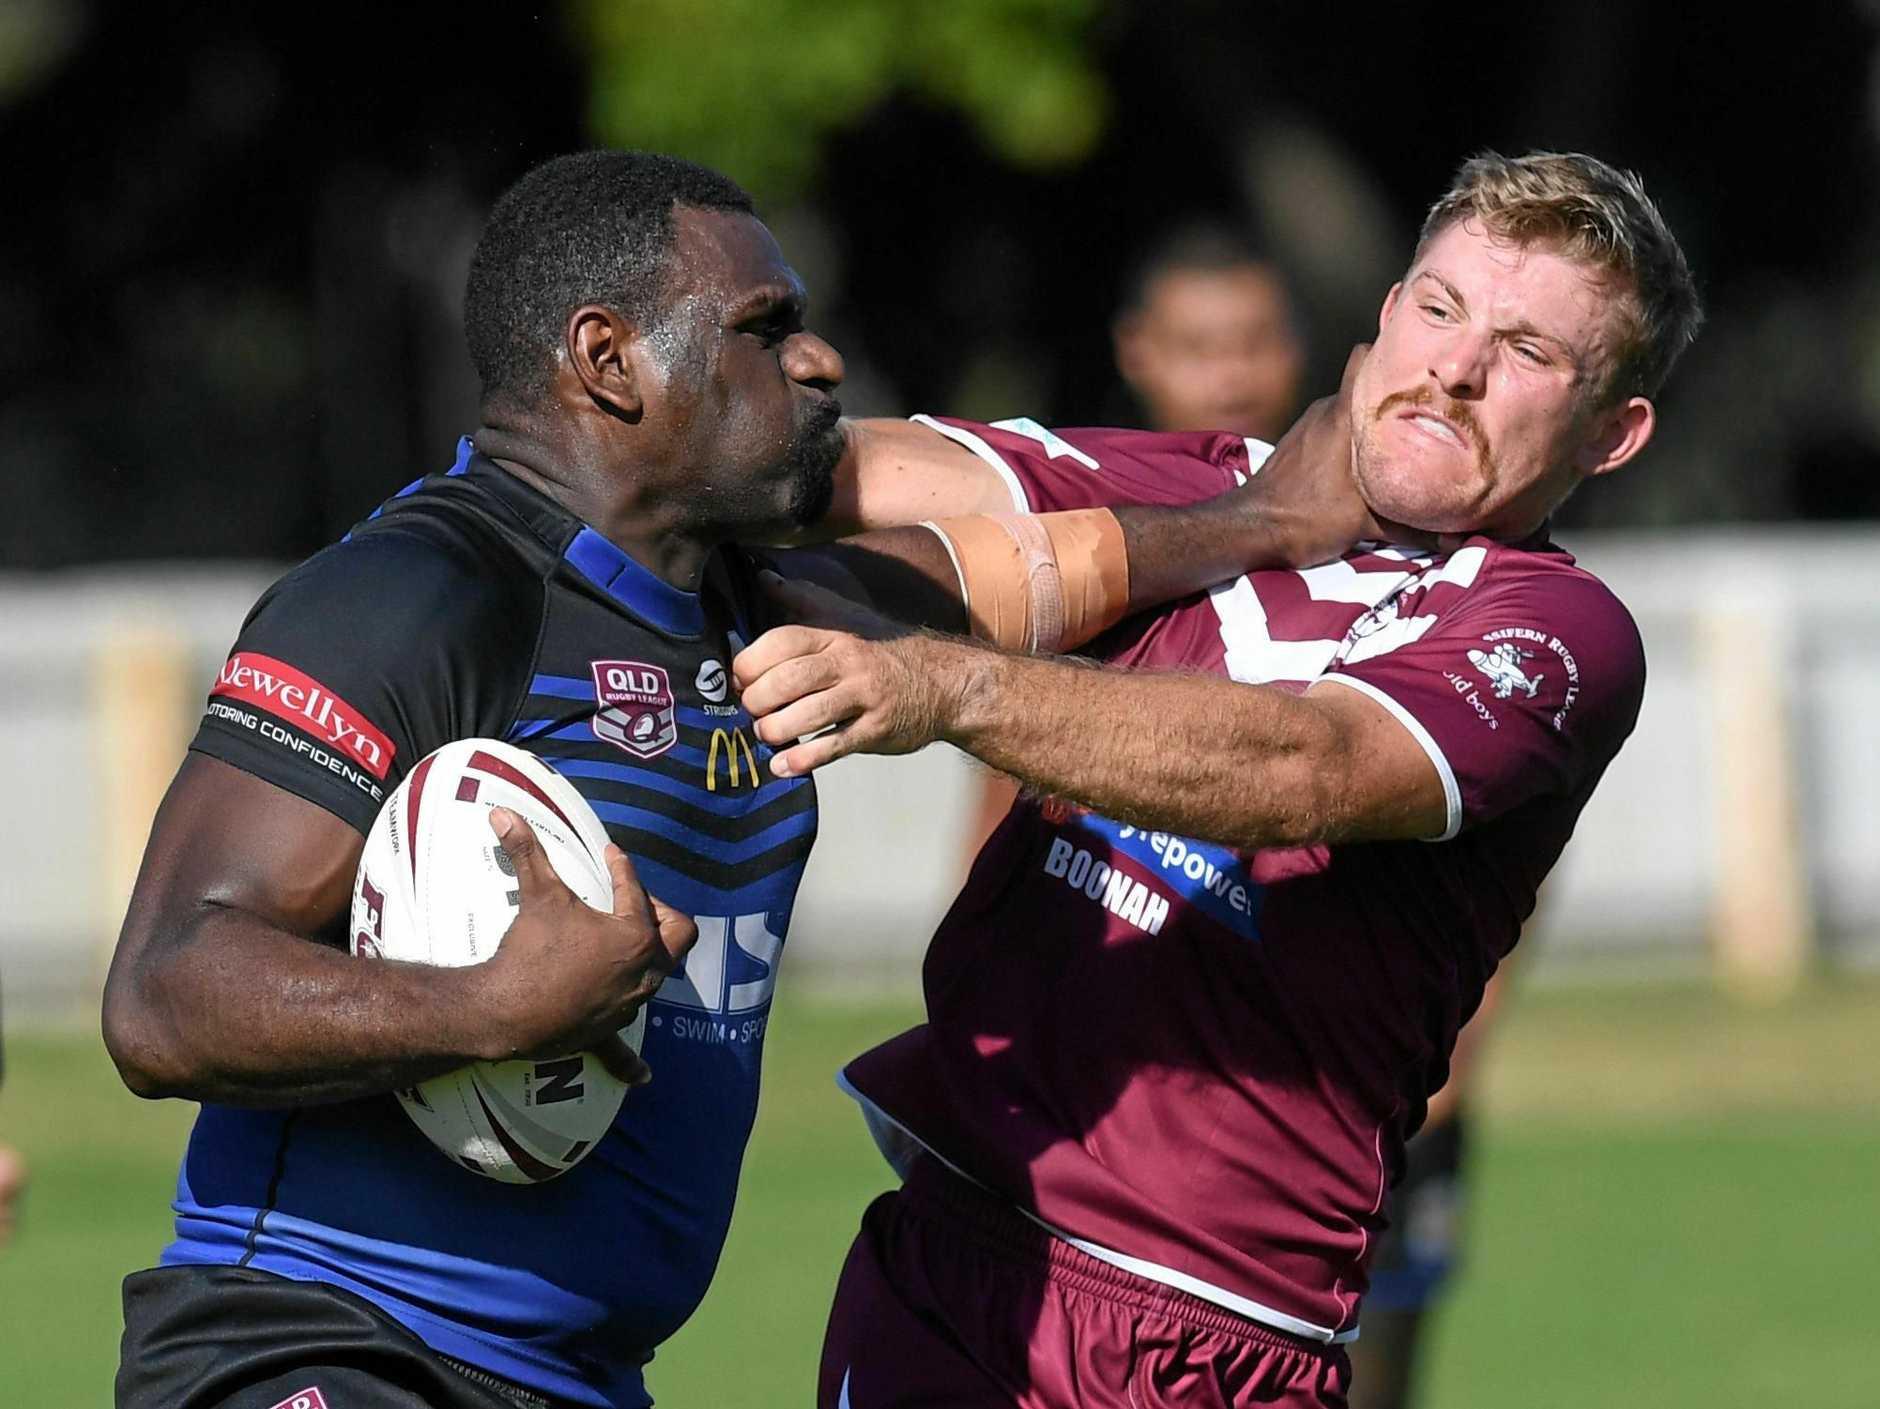 Raymond Baira gives Alex Ross a stiff arm to the throat in the Goodna, Fassifern RLI clash at Woogaroo Field.